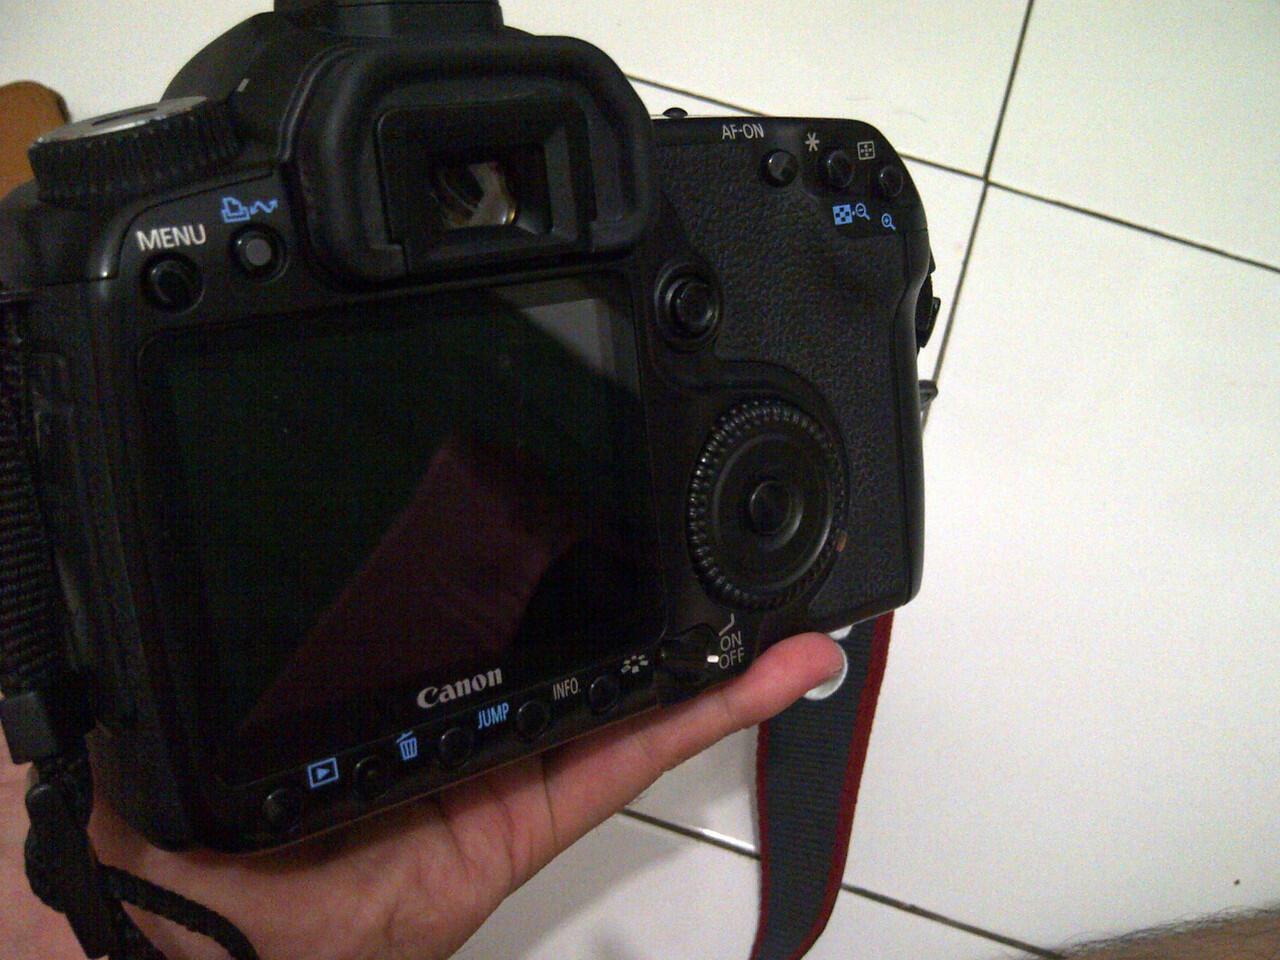 JUAL CANON 40D kit 18-55mm Bandung Murah Barang Bagus